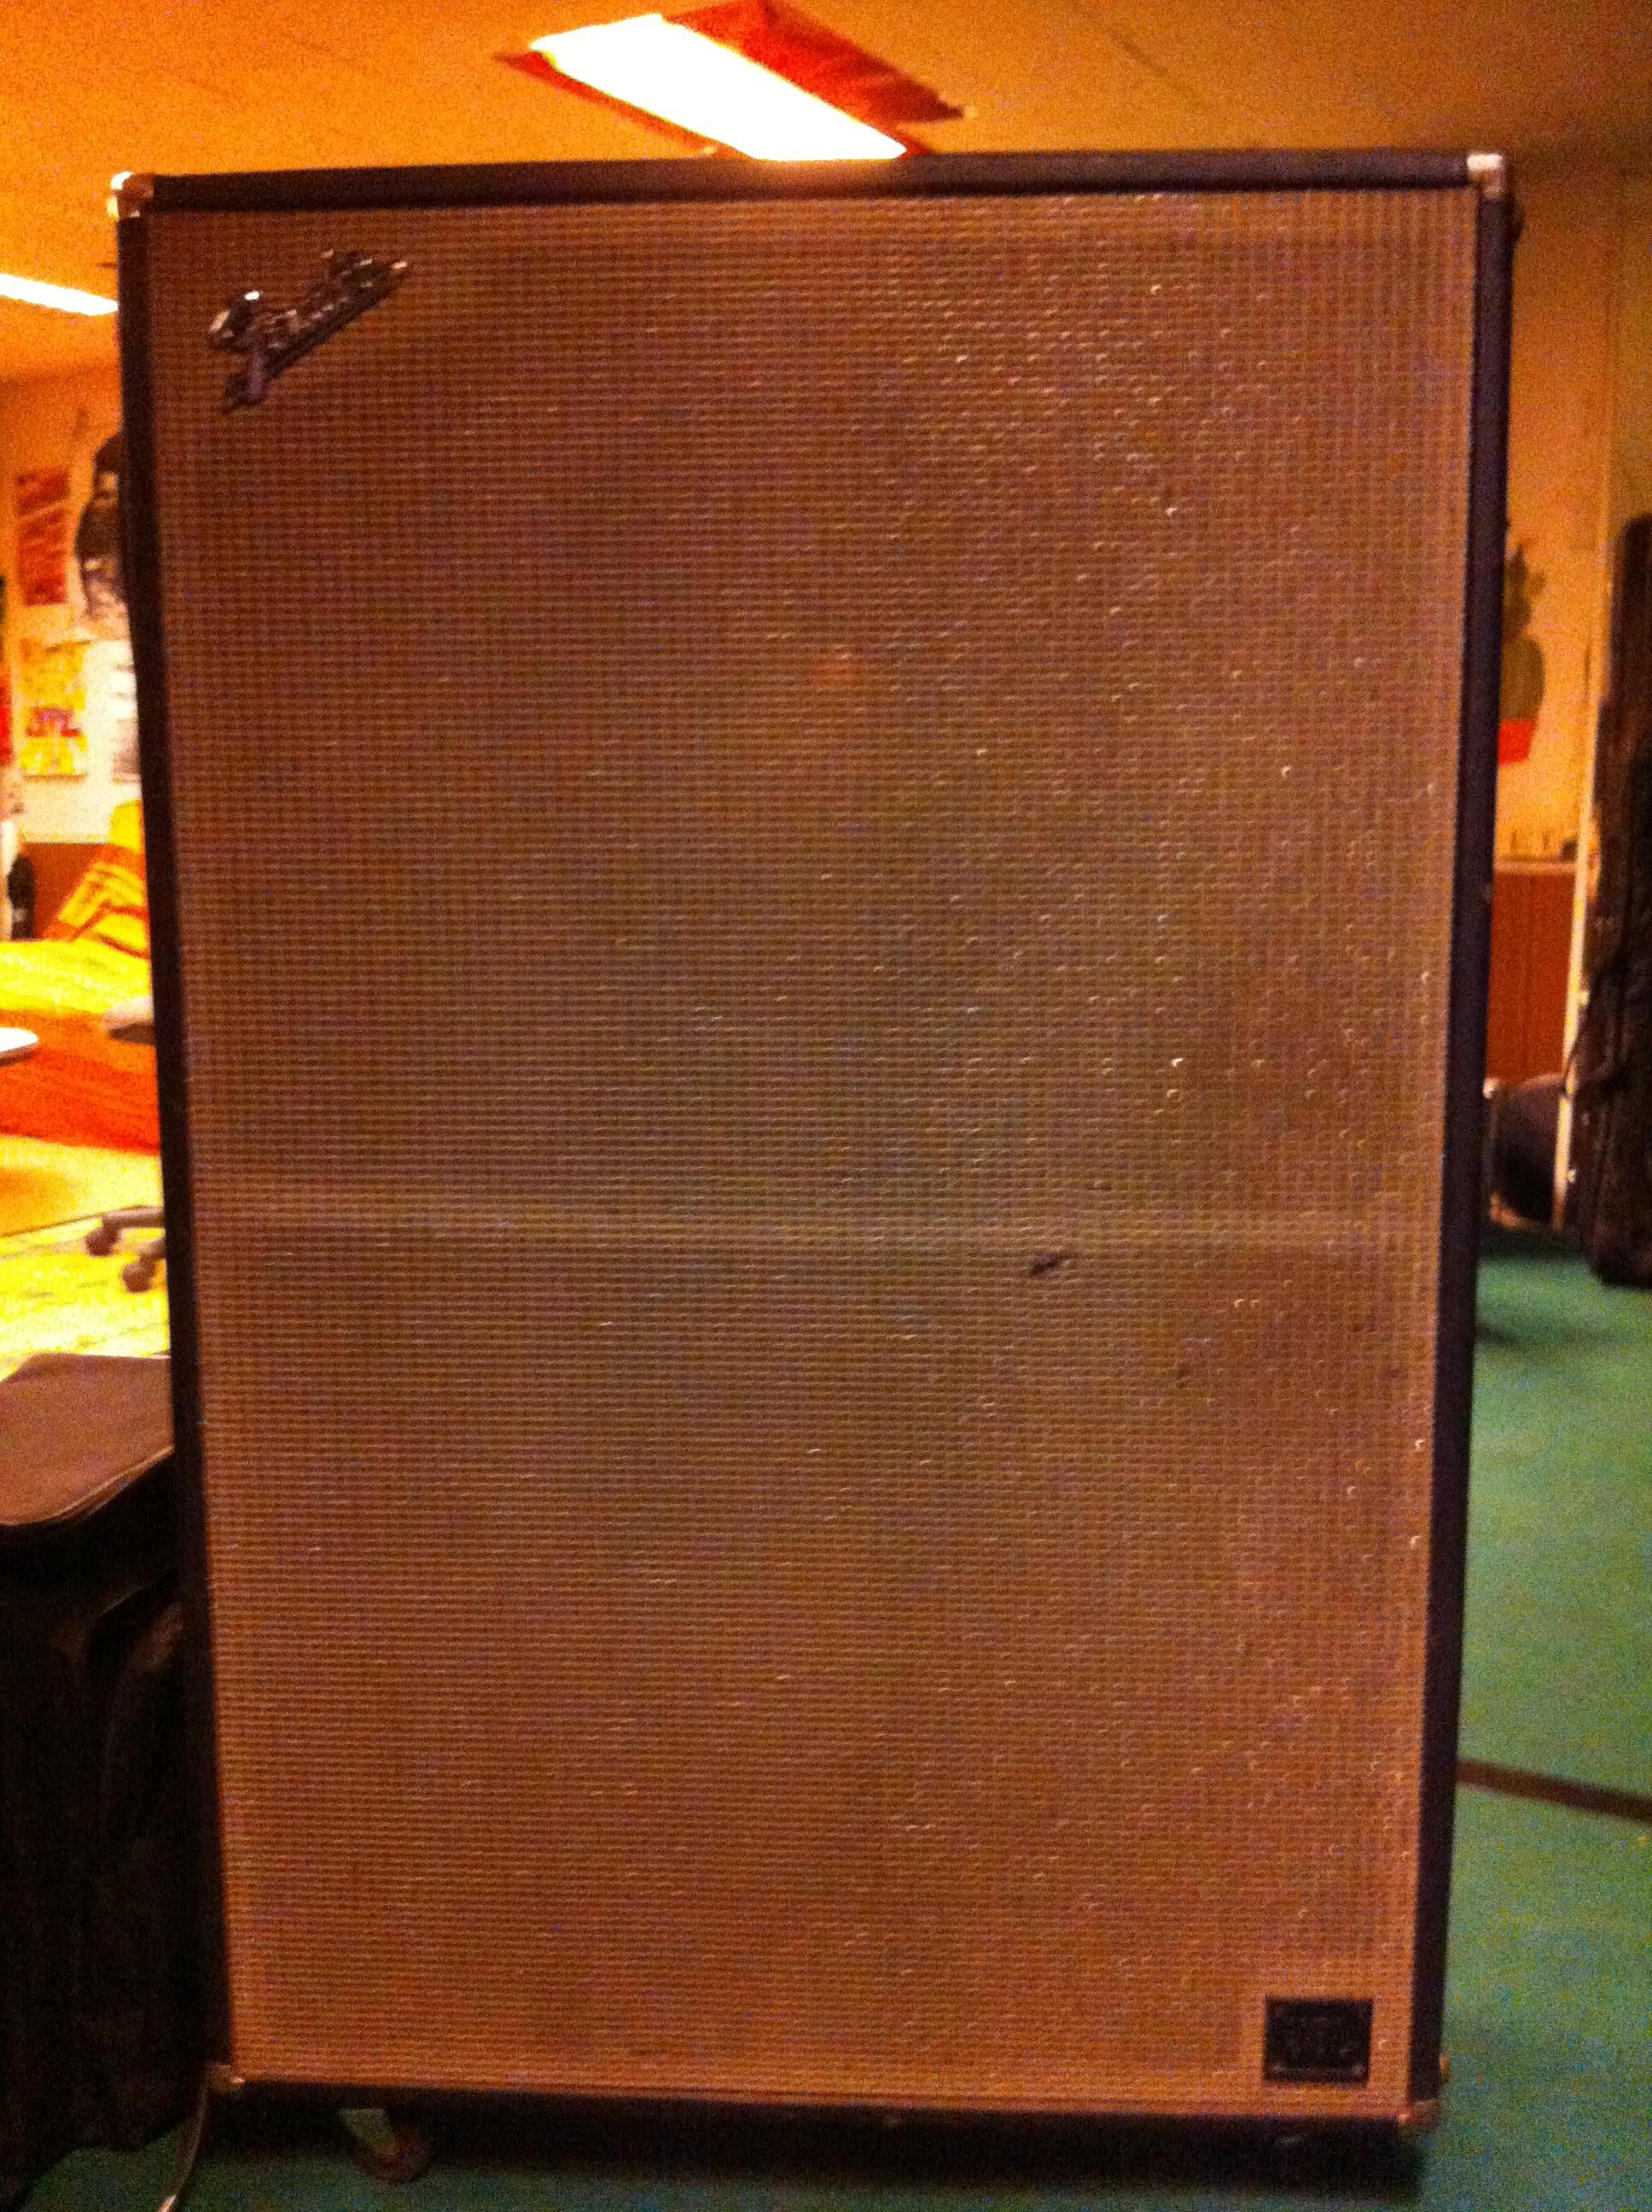 fender bassman  cabinet  image  audiofanzine